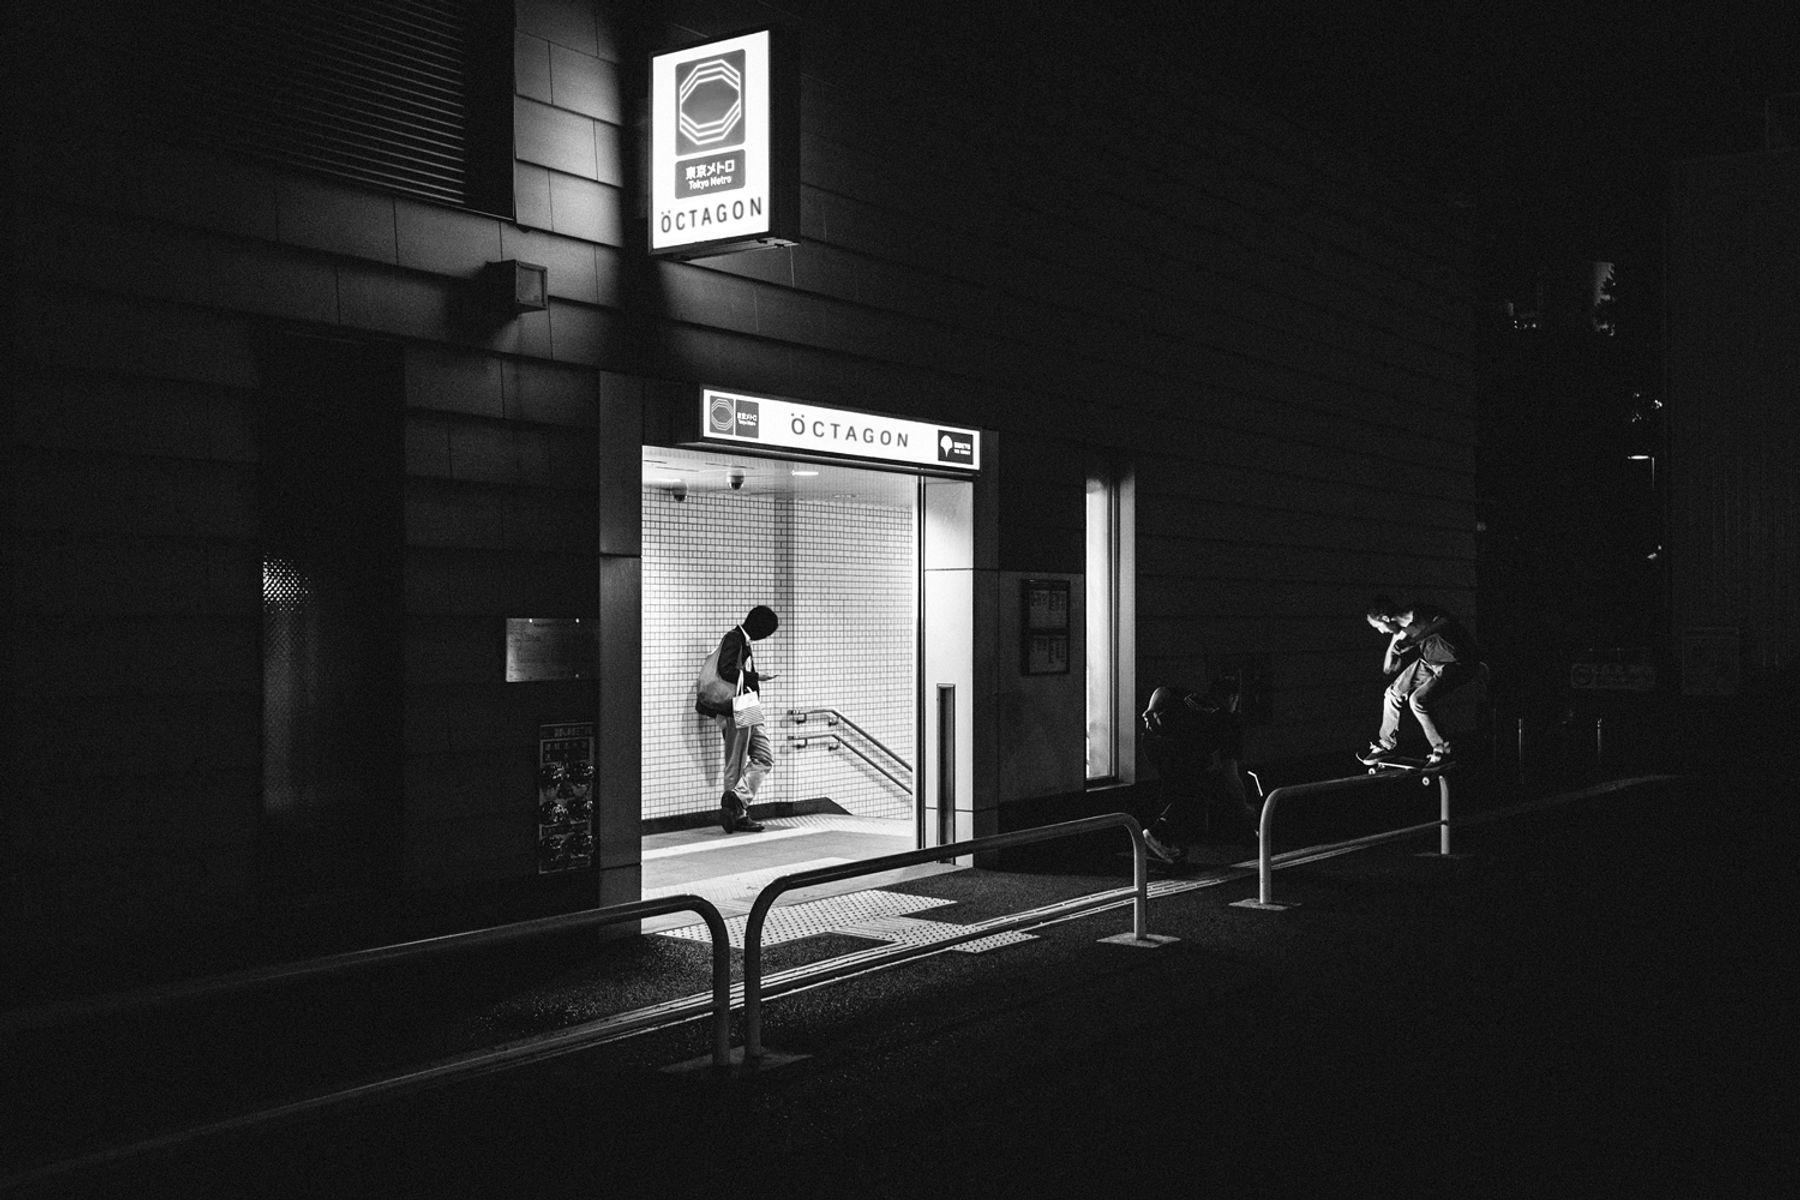 Joseph-Biais_switch-frontside-boardslide-©Maxime-Verret